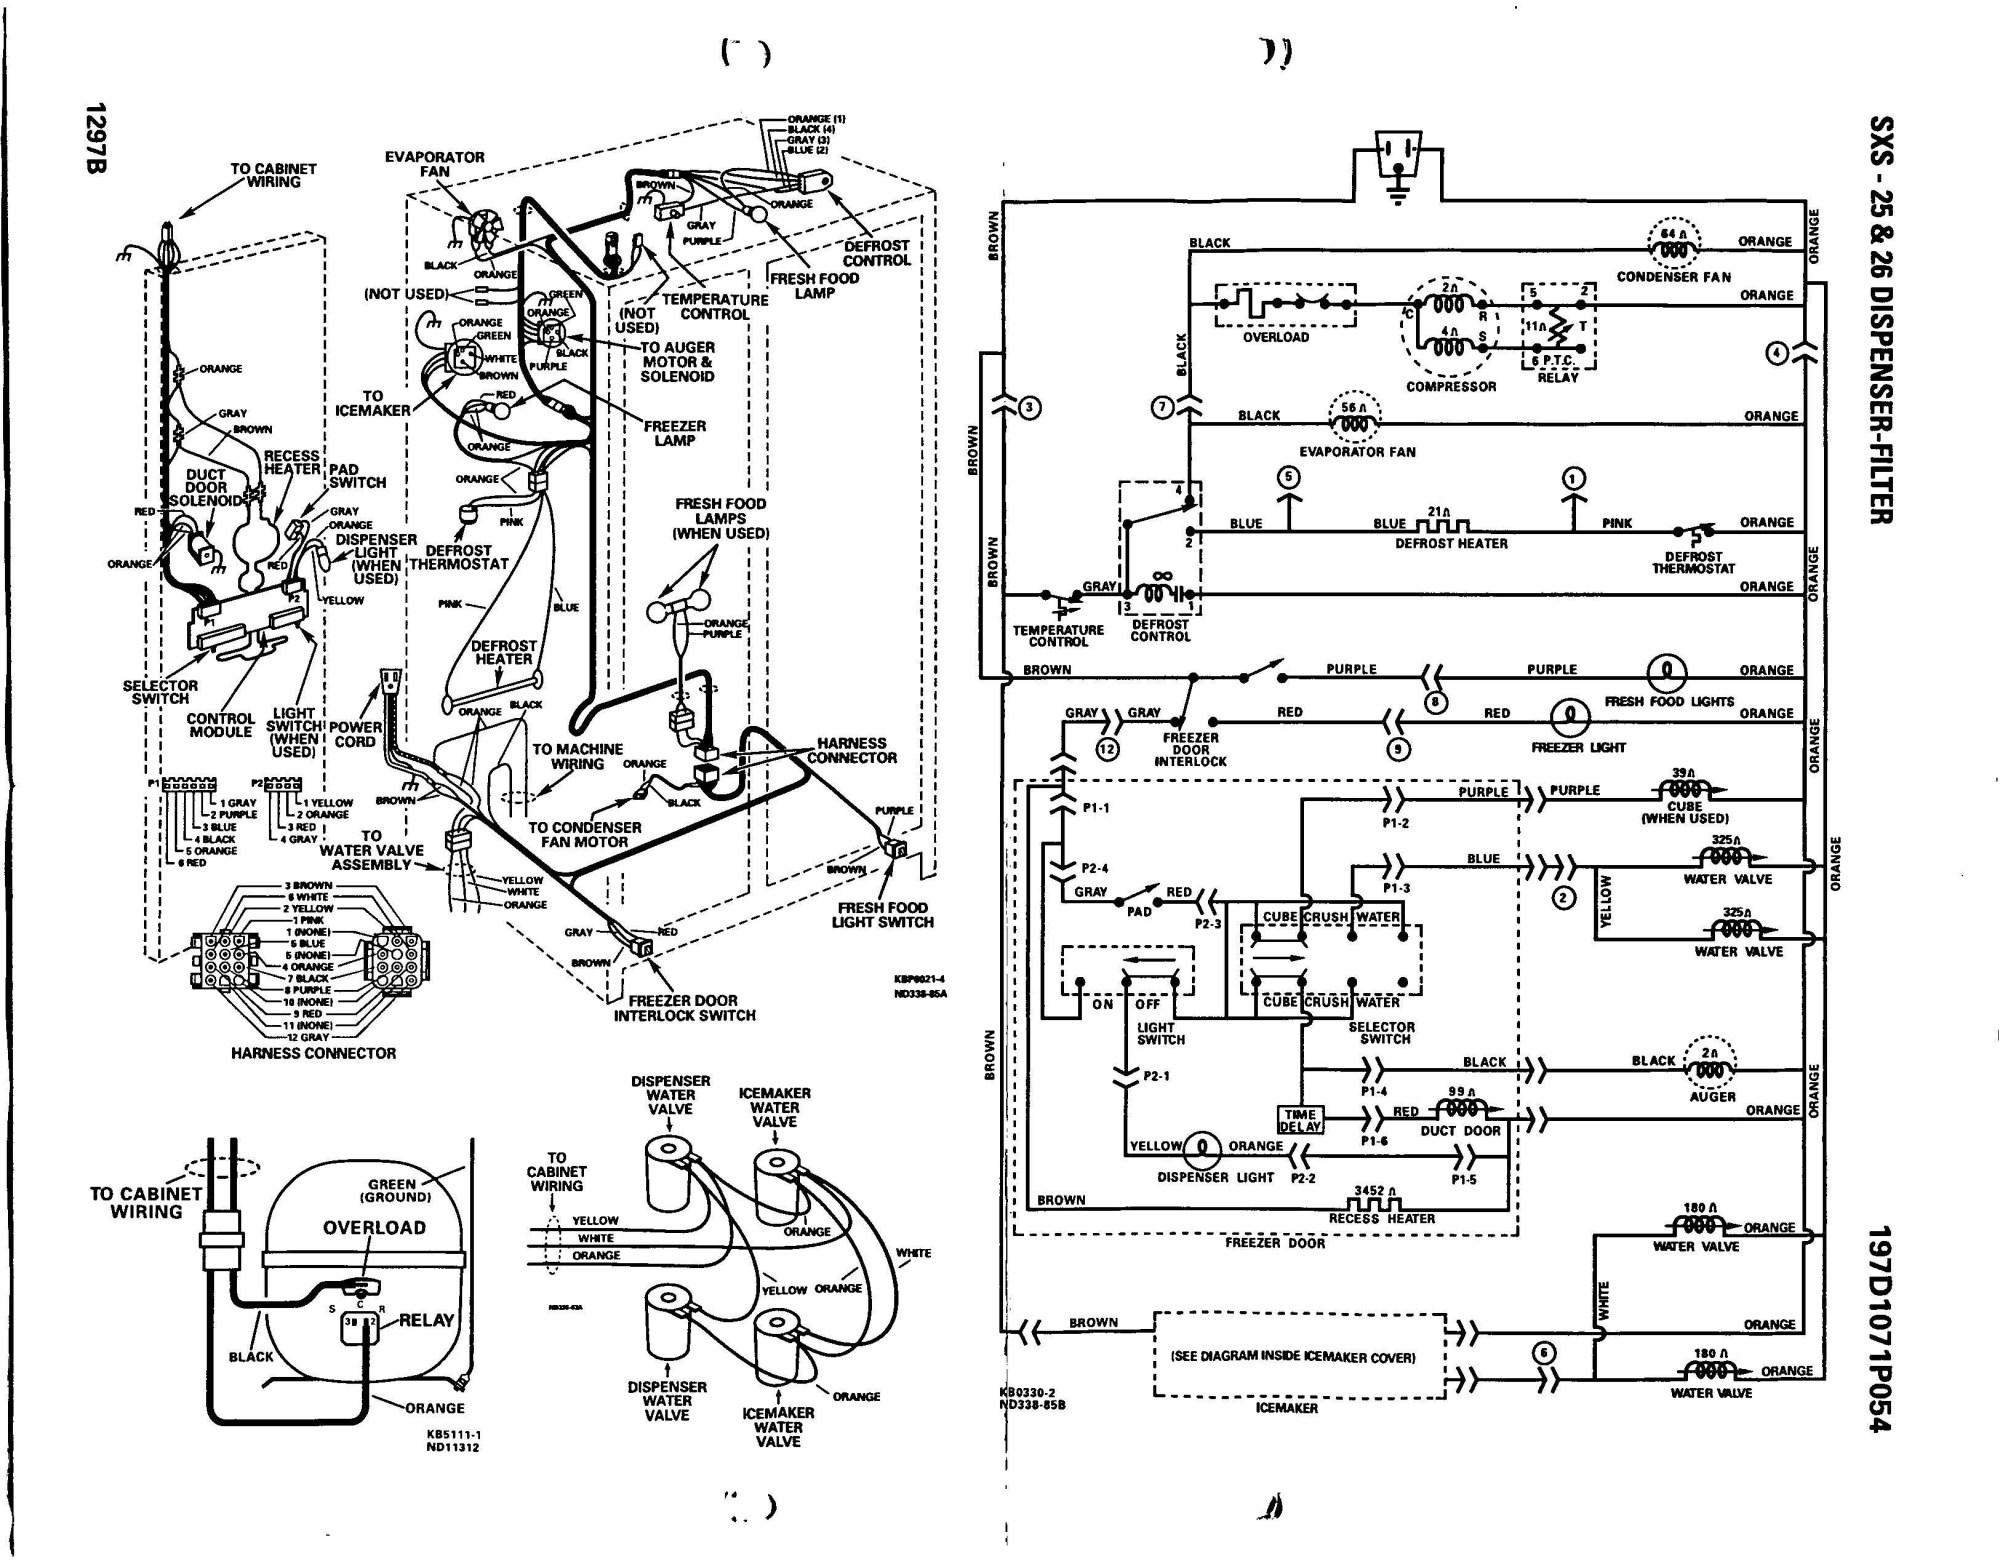 hight resolution of 1937 ge refrigerator wiring diagram wiring schematic diagram1937 ge refrigerator wiring diagram wiring library ge refrigerator